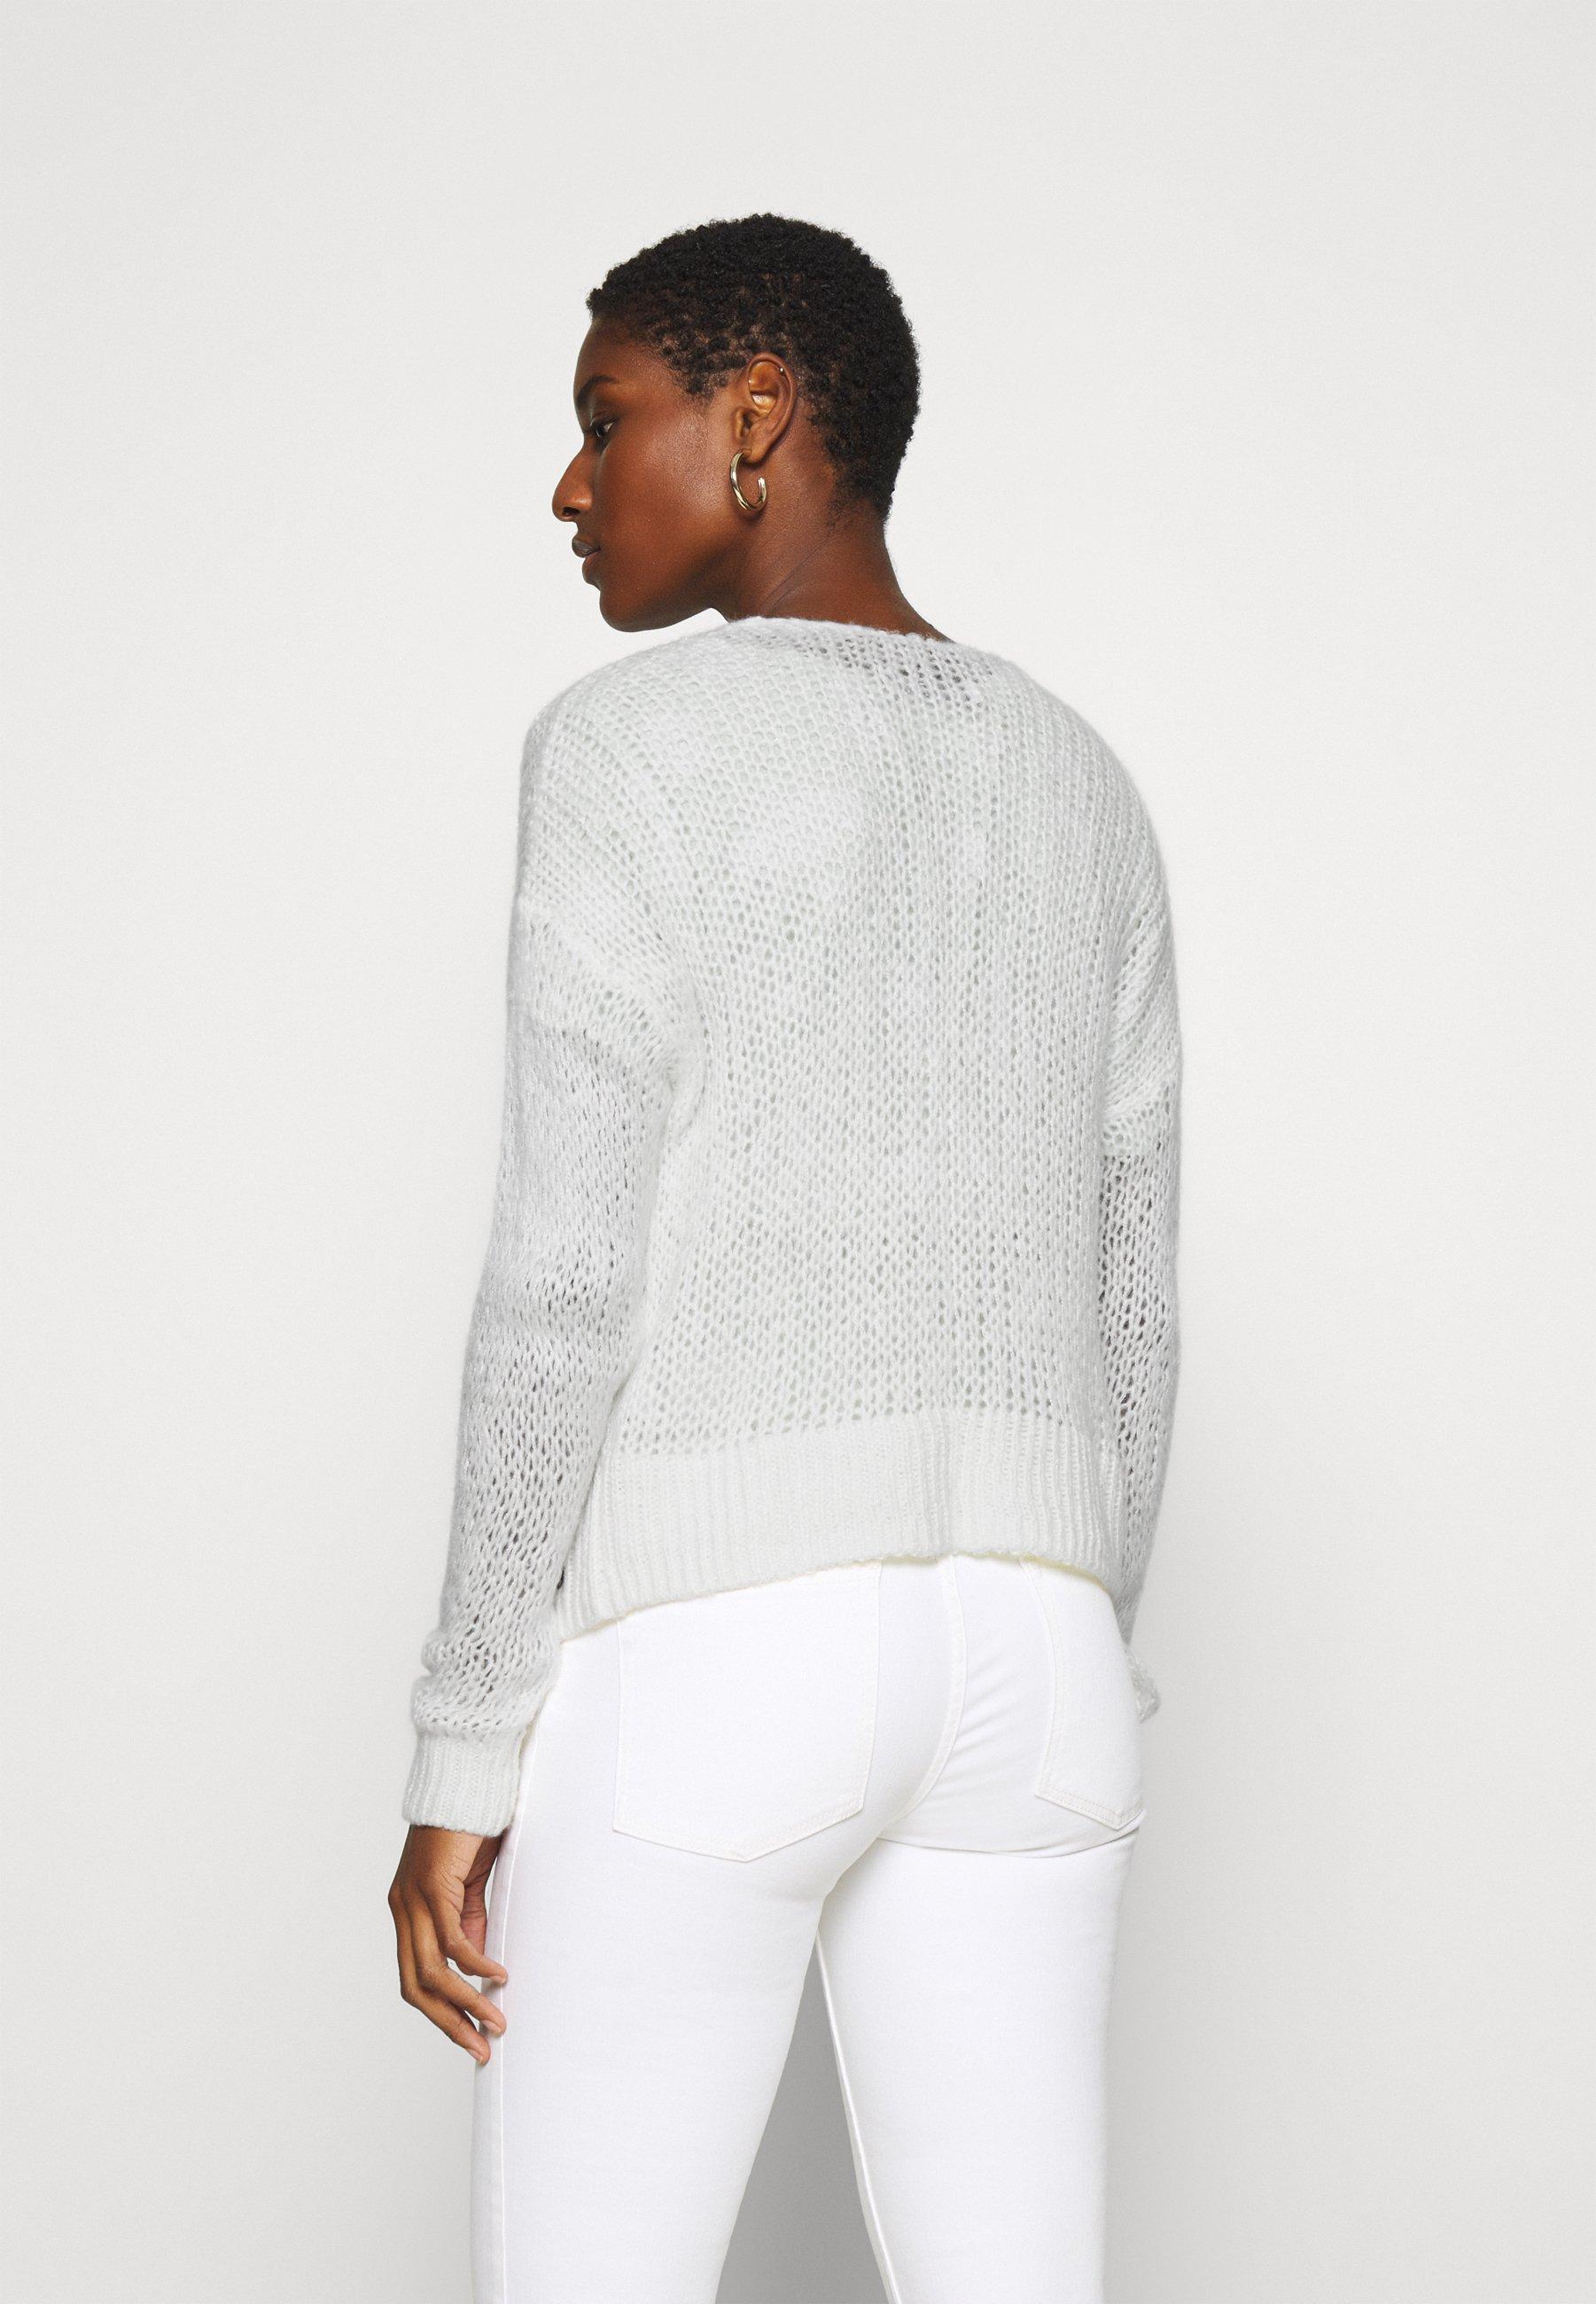 Abercrombie & Fitch LOUISE OPEN STITCH  - Vest - white - Dames jas Aanbod